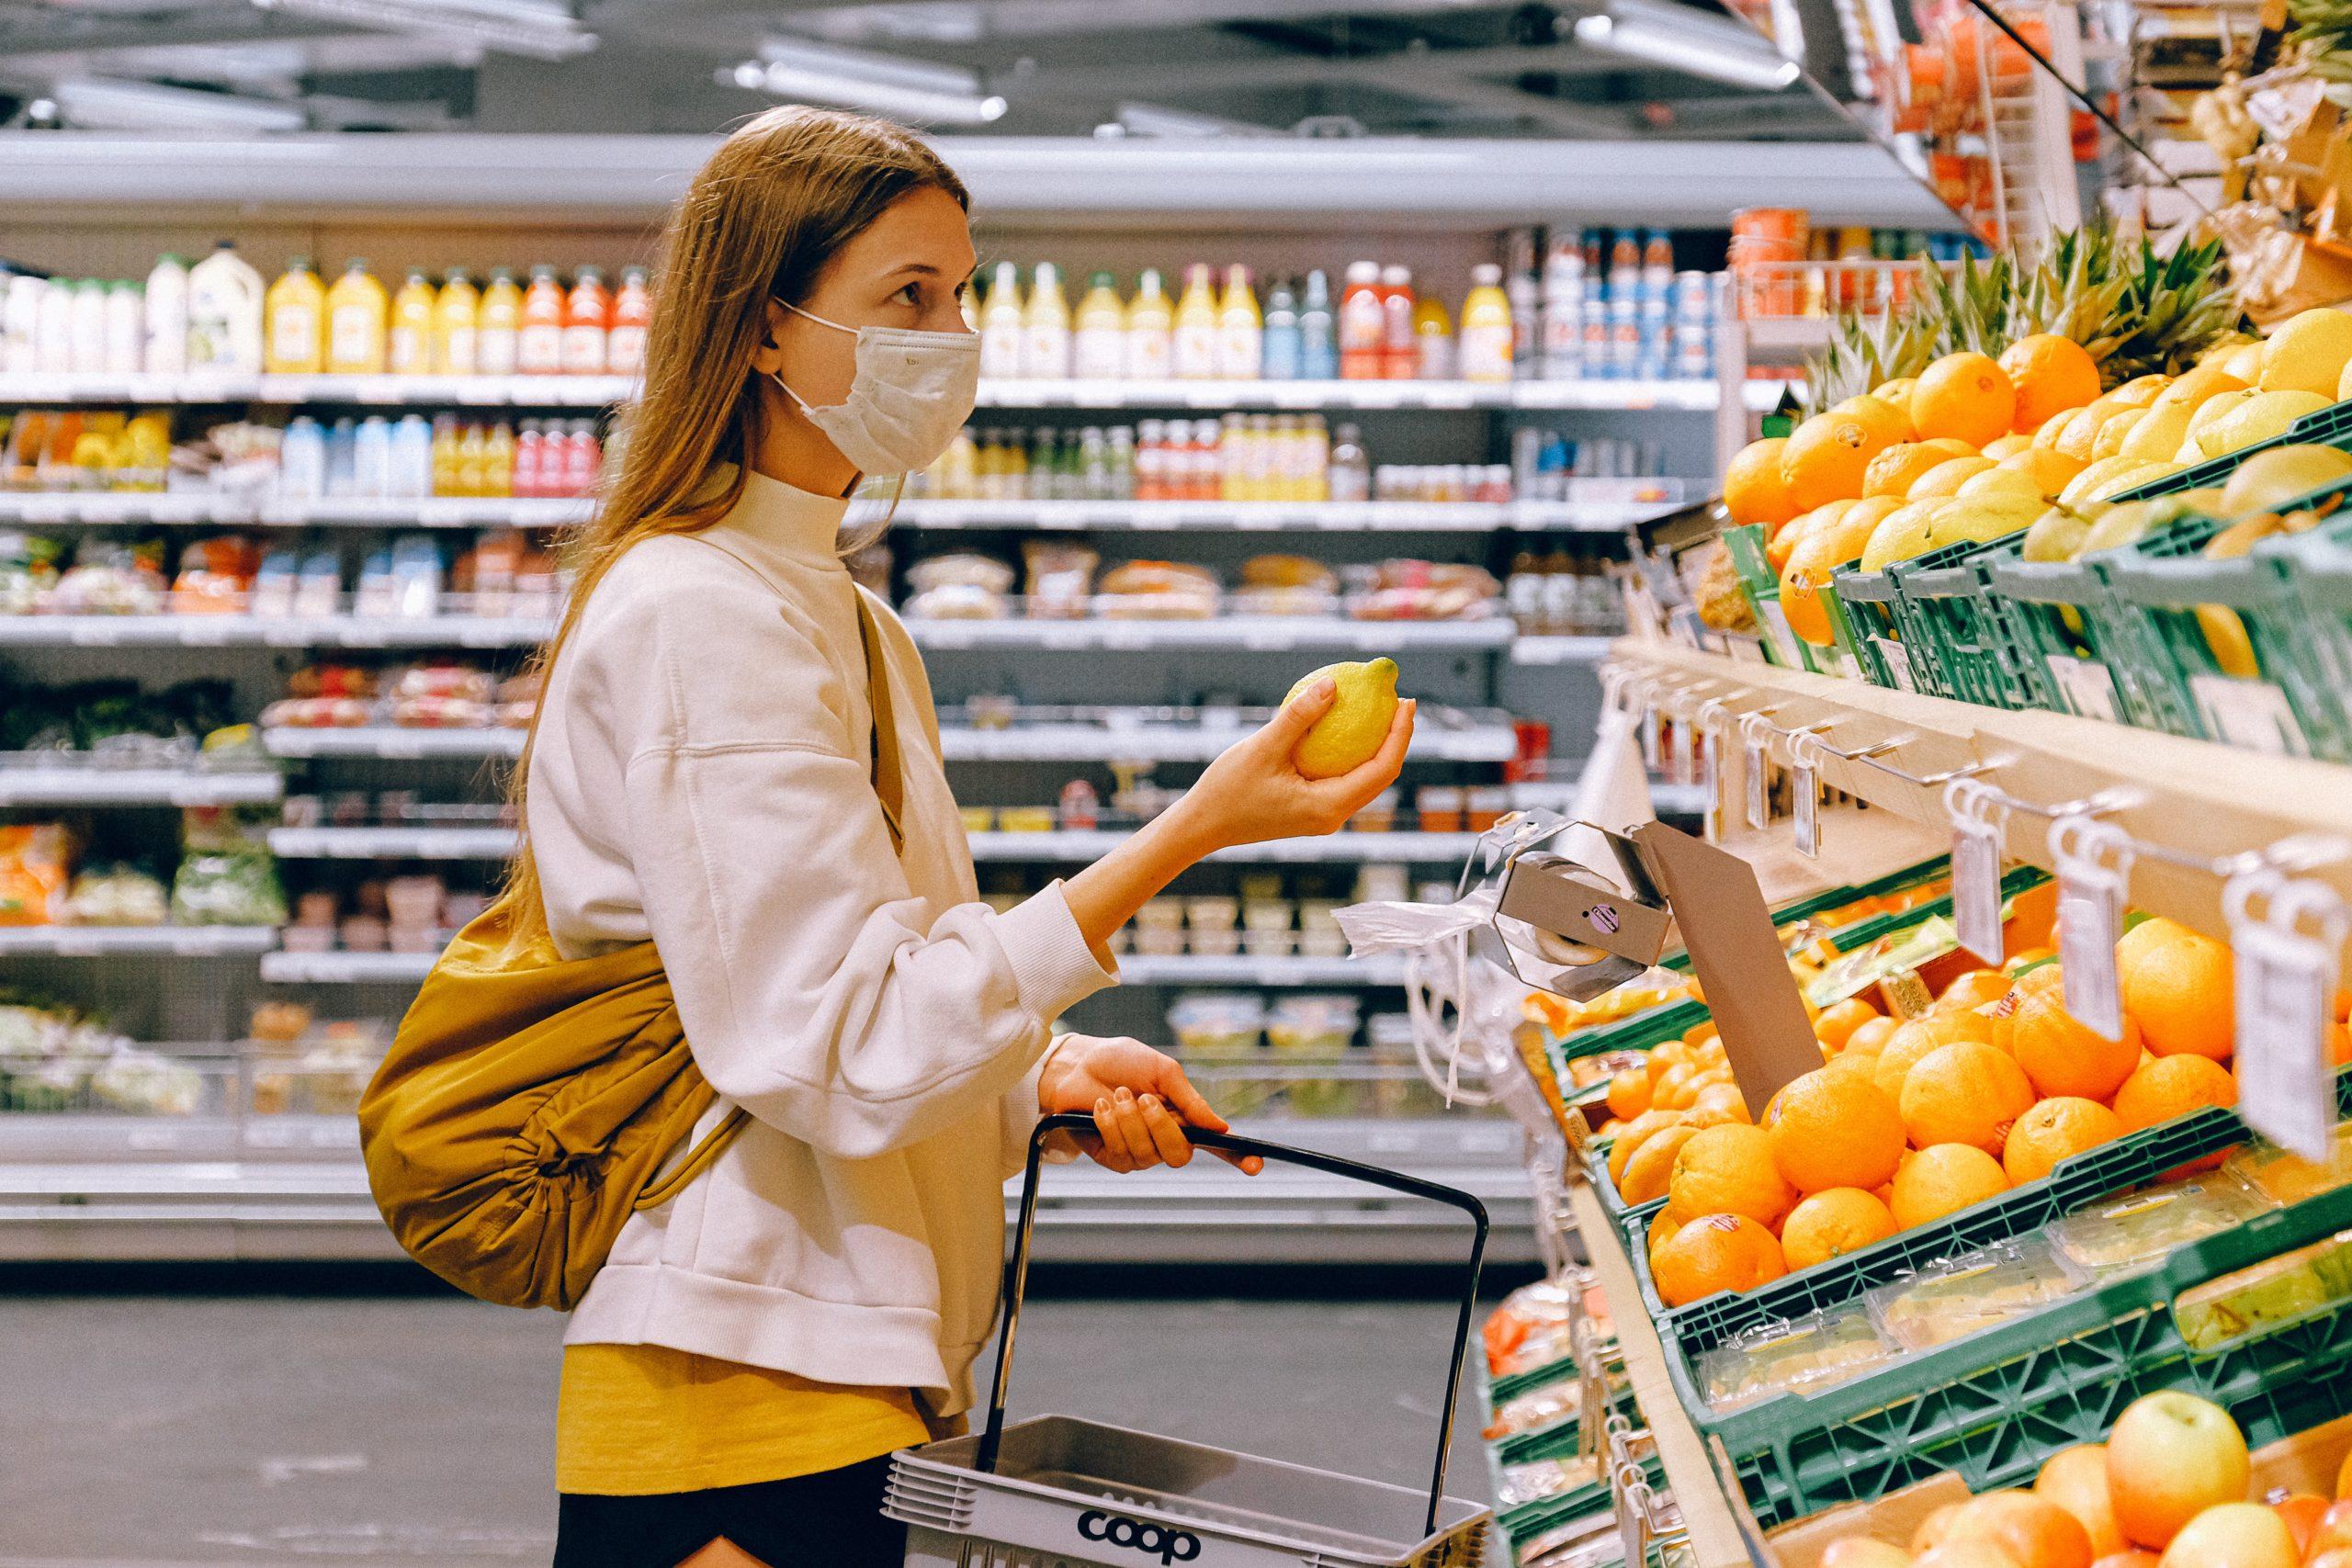 Lady in supermarket wearing mask